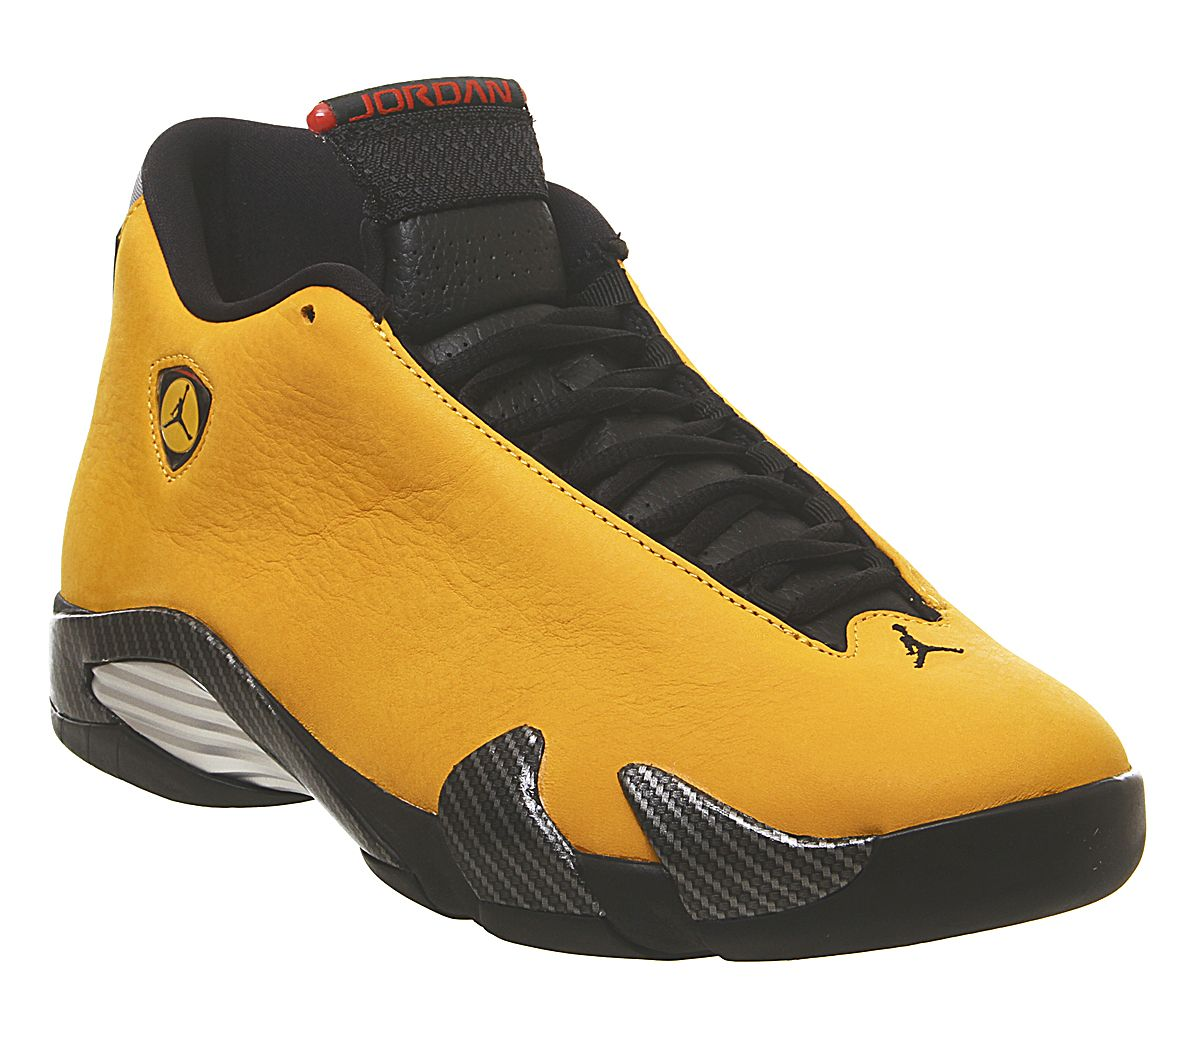 online retailer cf152 09156 Jordan Air Jordan 14 Retro University Gold Black University ...